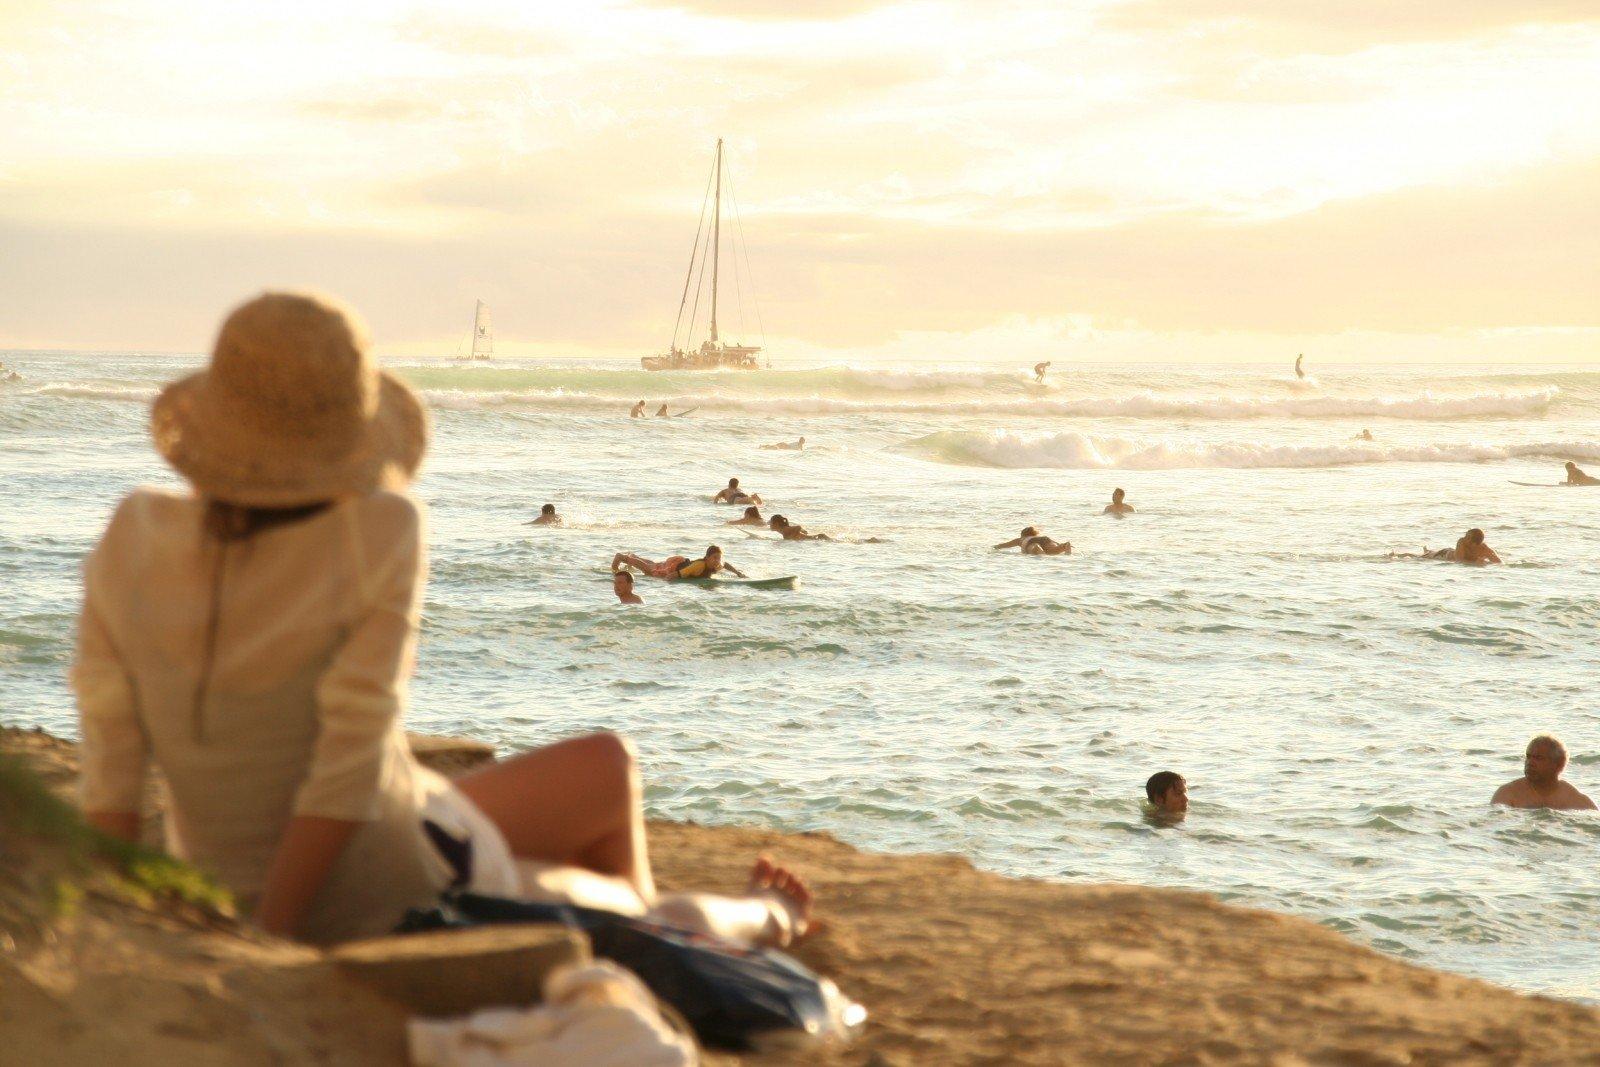 What makes Waikiki Special?